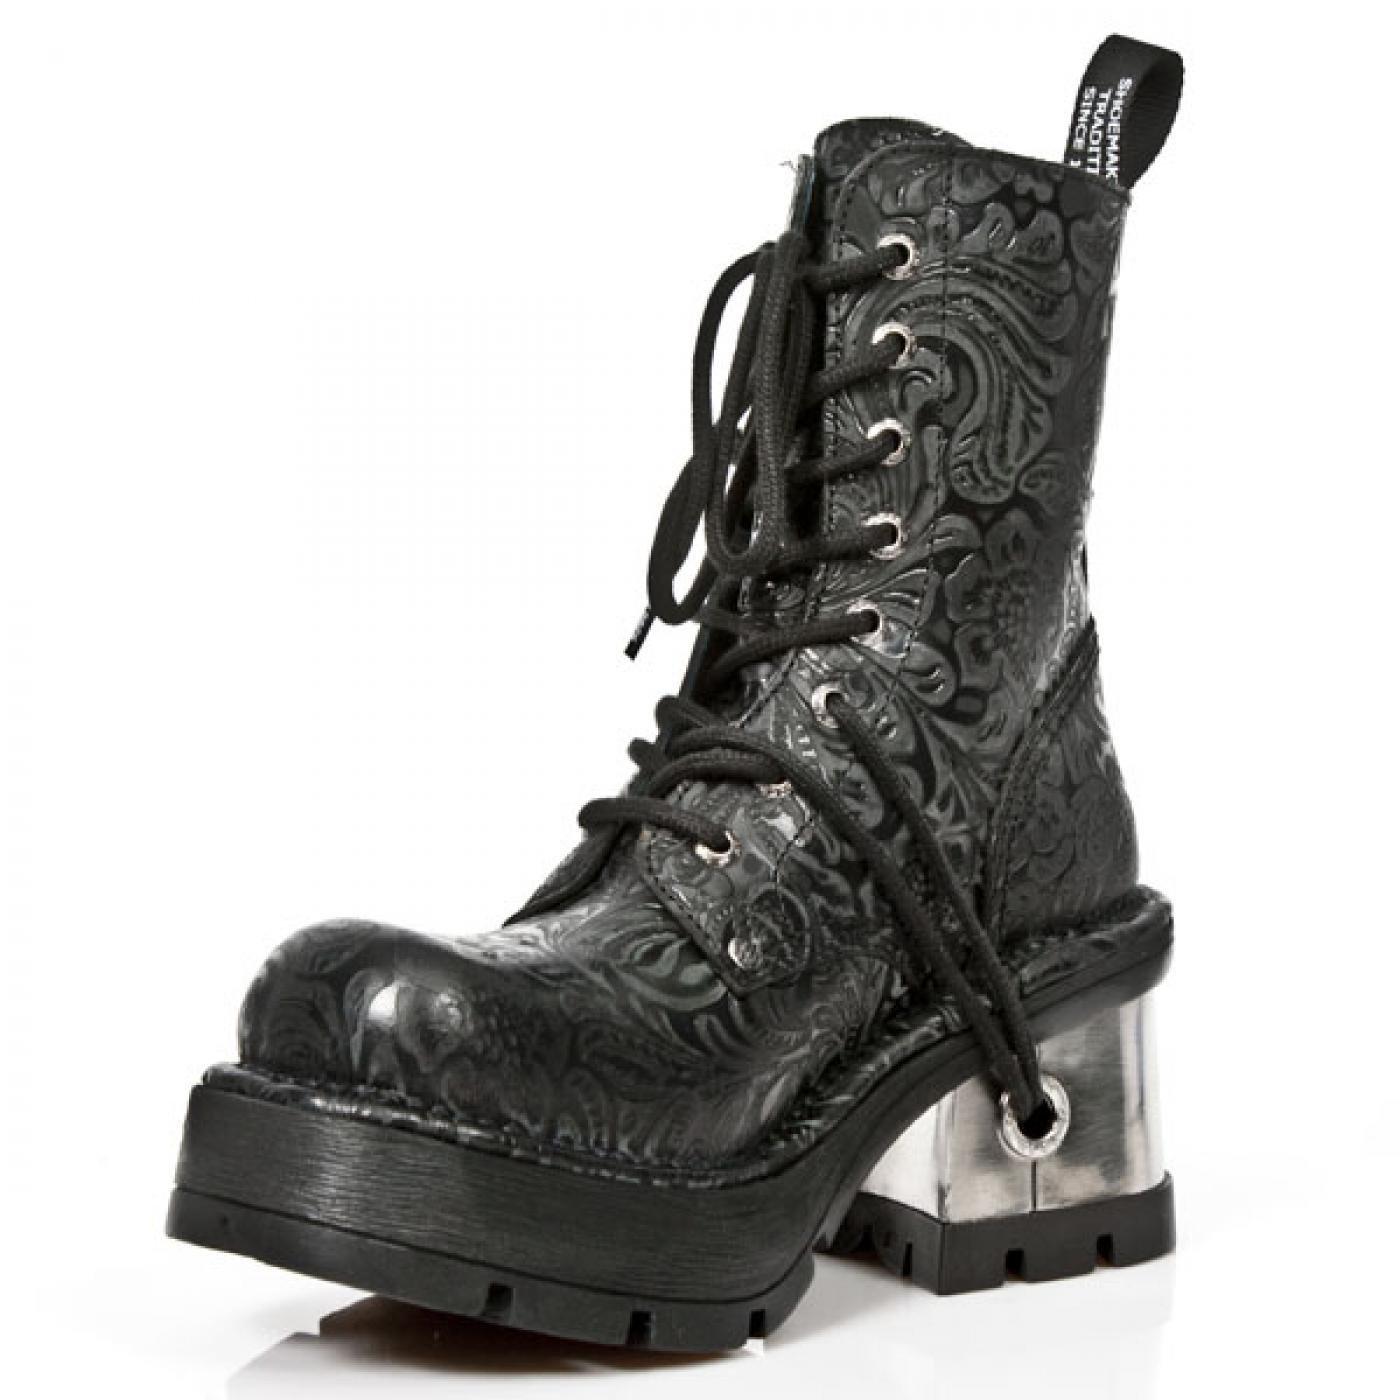 Stiefel & Stiefeletten New Rock Boots M.8355 S2 Gothic